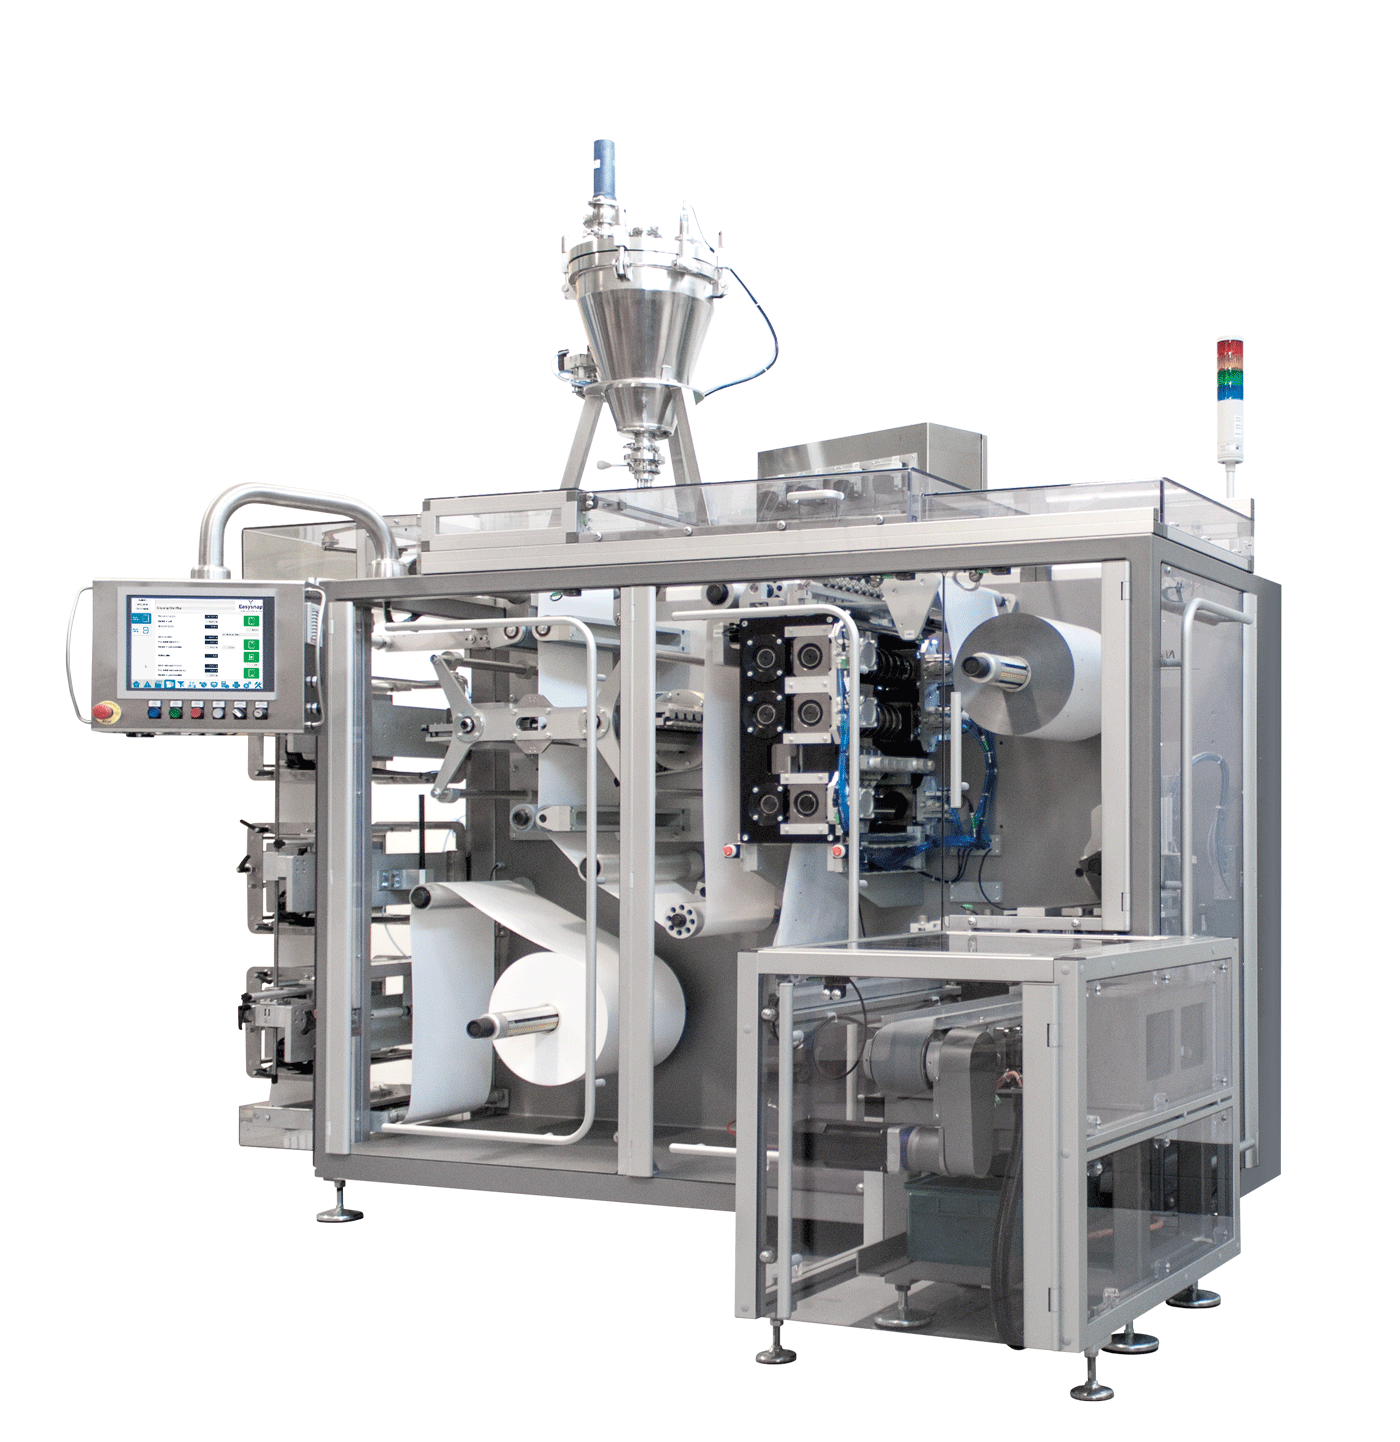 Pulsar 351 Easysnap Technology Machinery